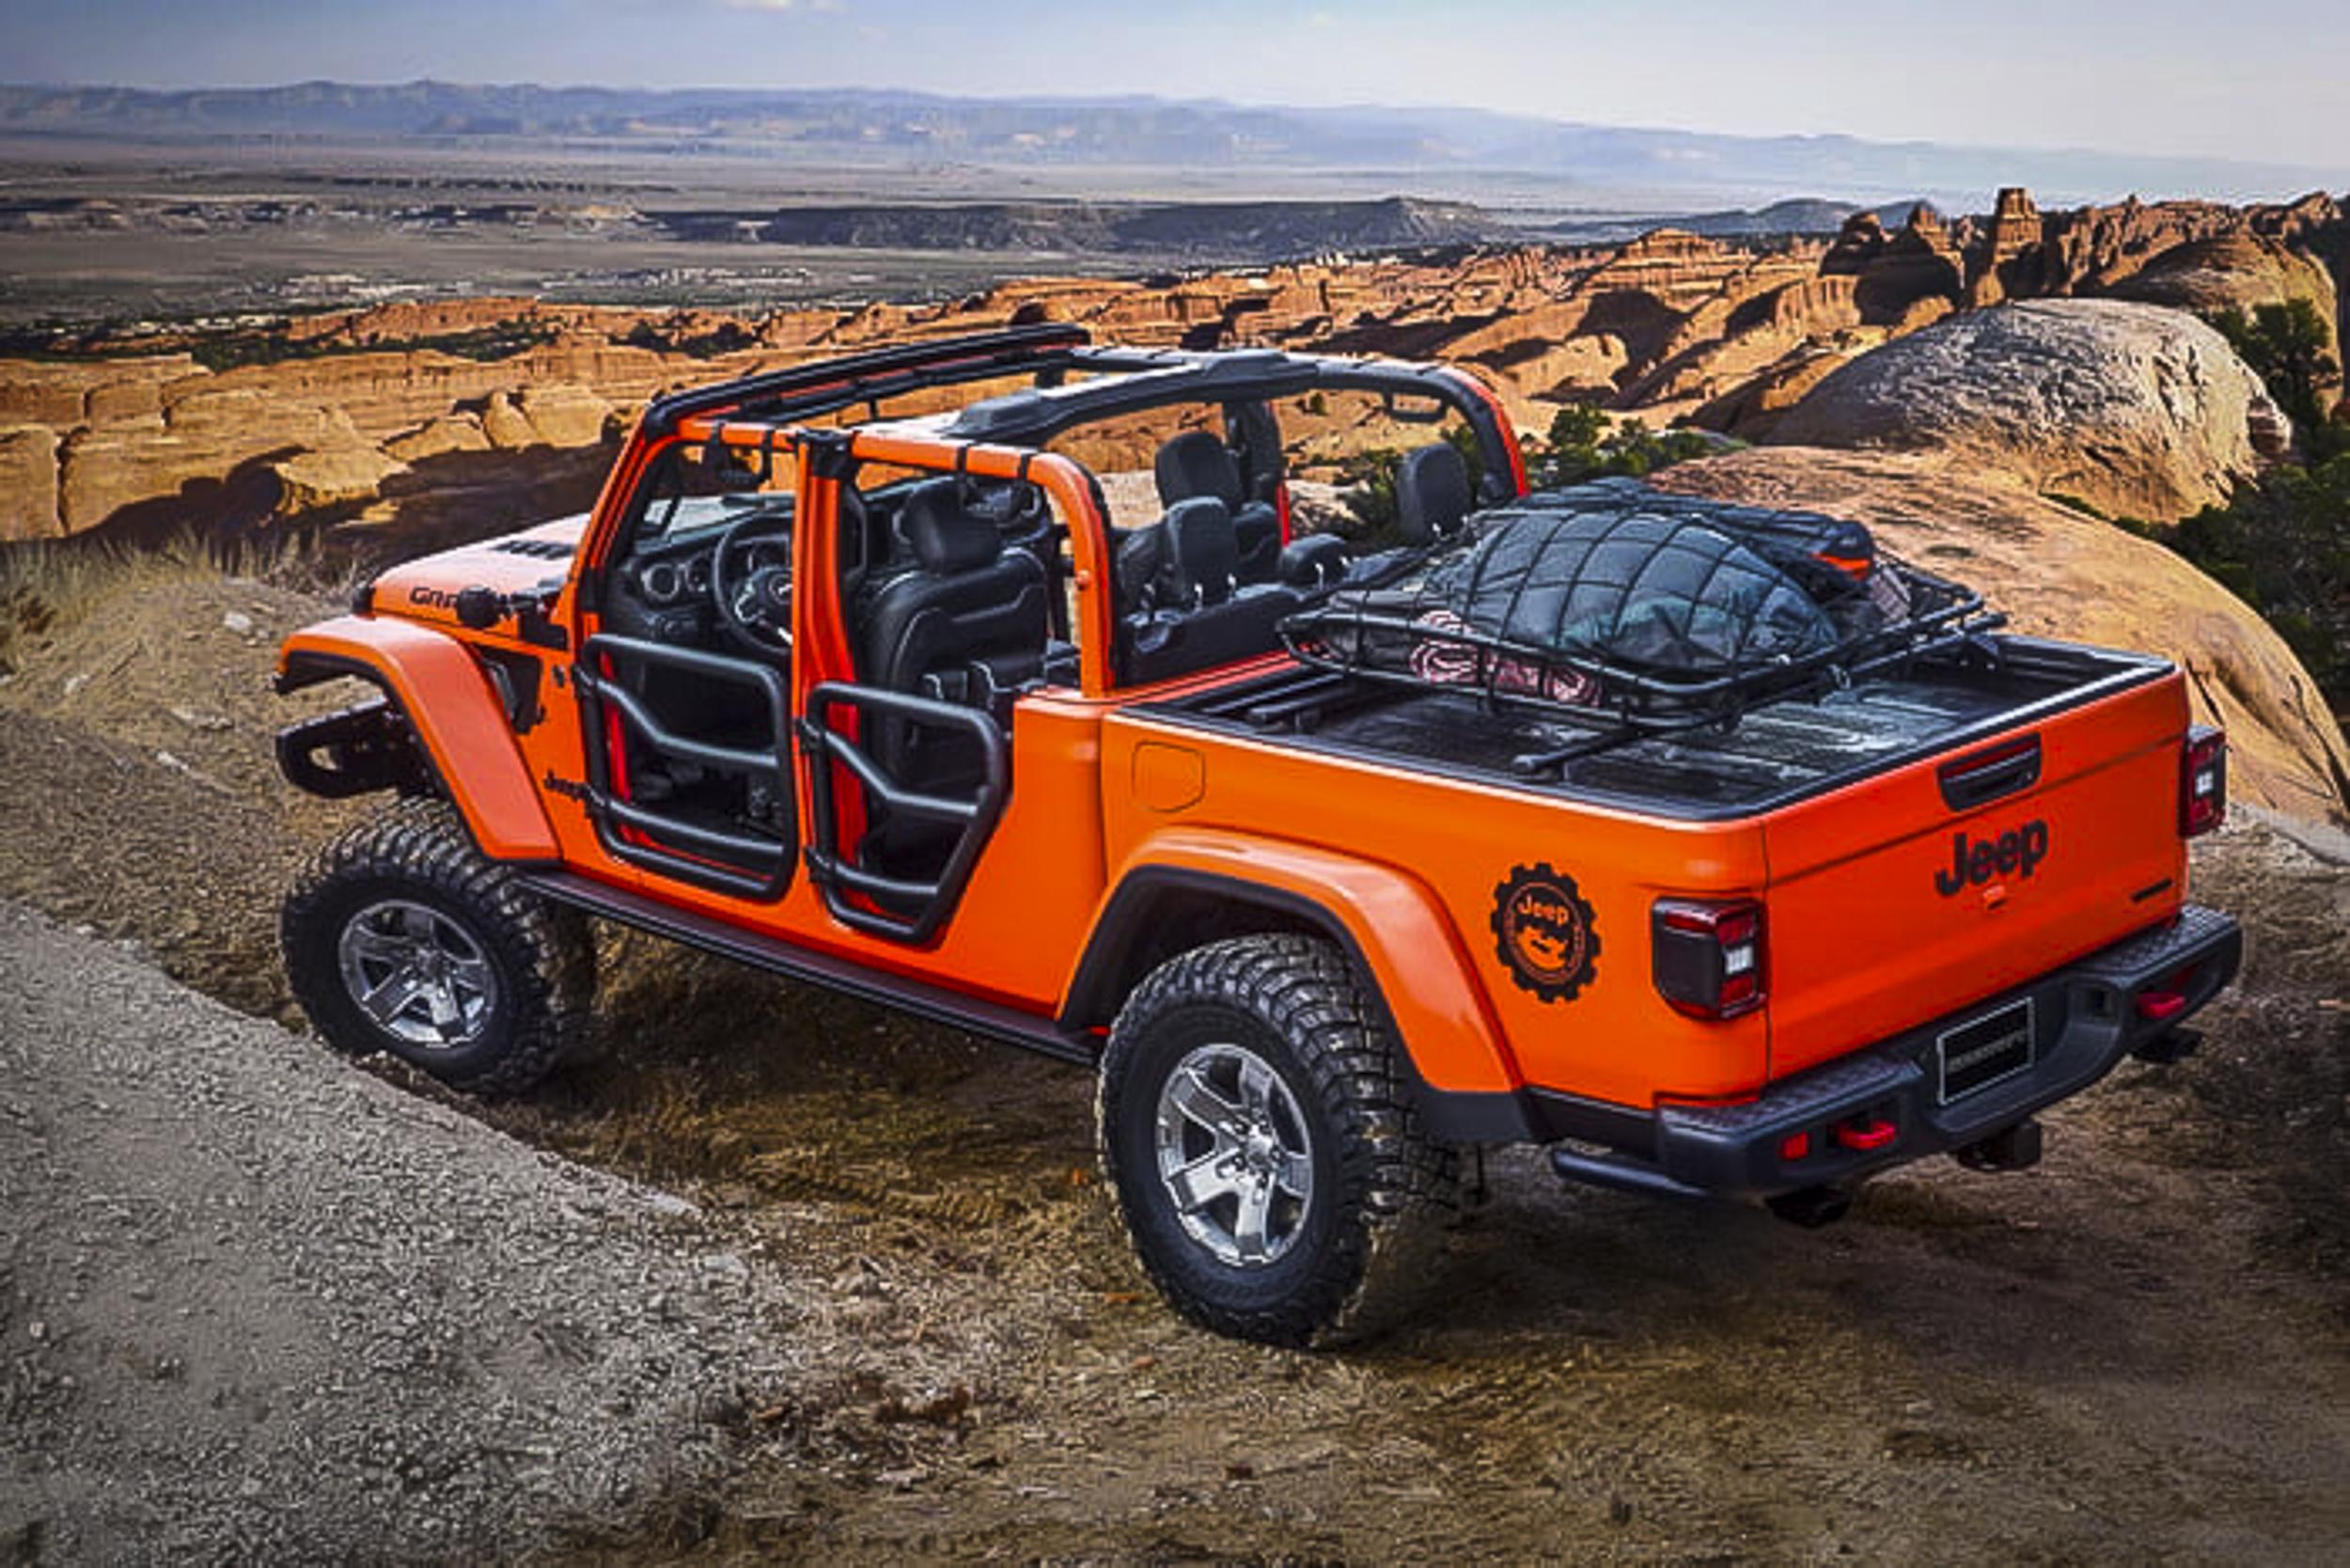 2019-jeep-moab-safari-concepts-13-700x467-c.jpg